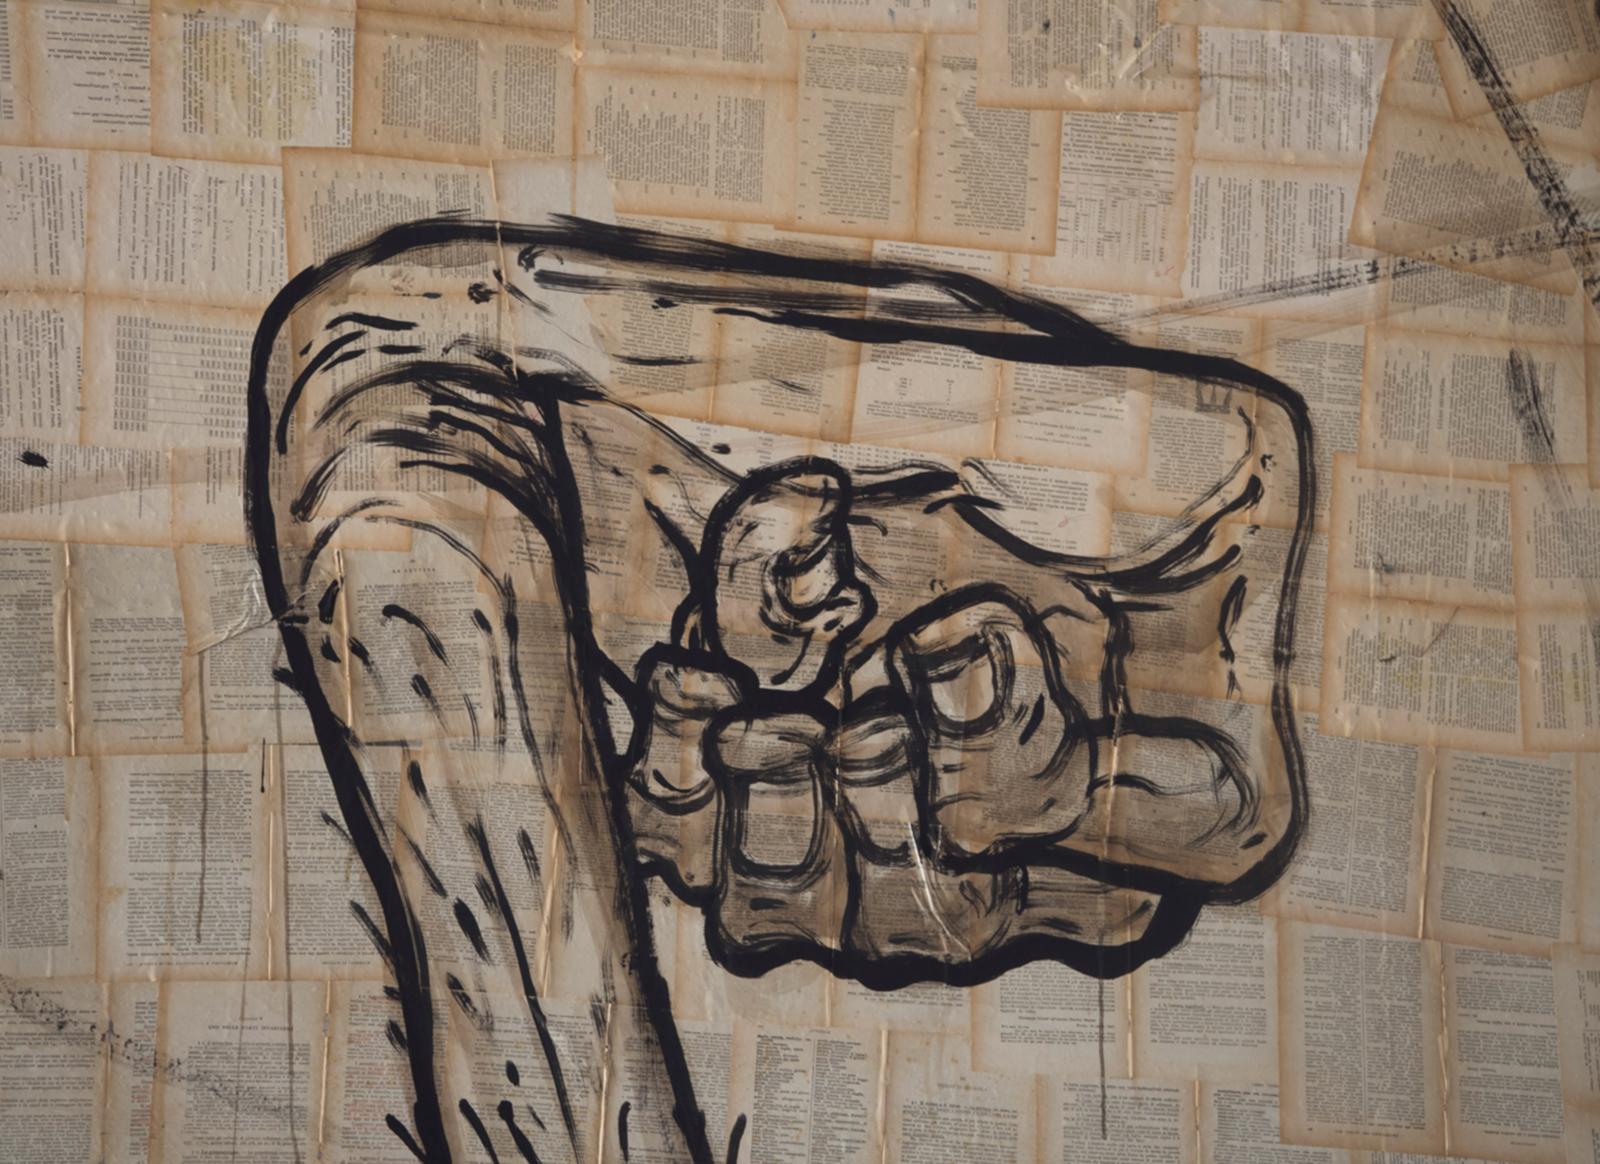 nemos-dissensocognitivo-natura-morta-mural-04